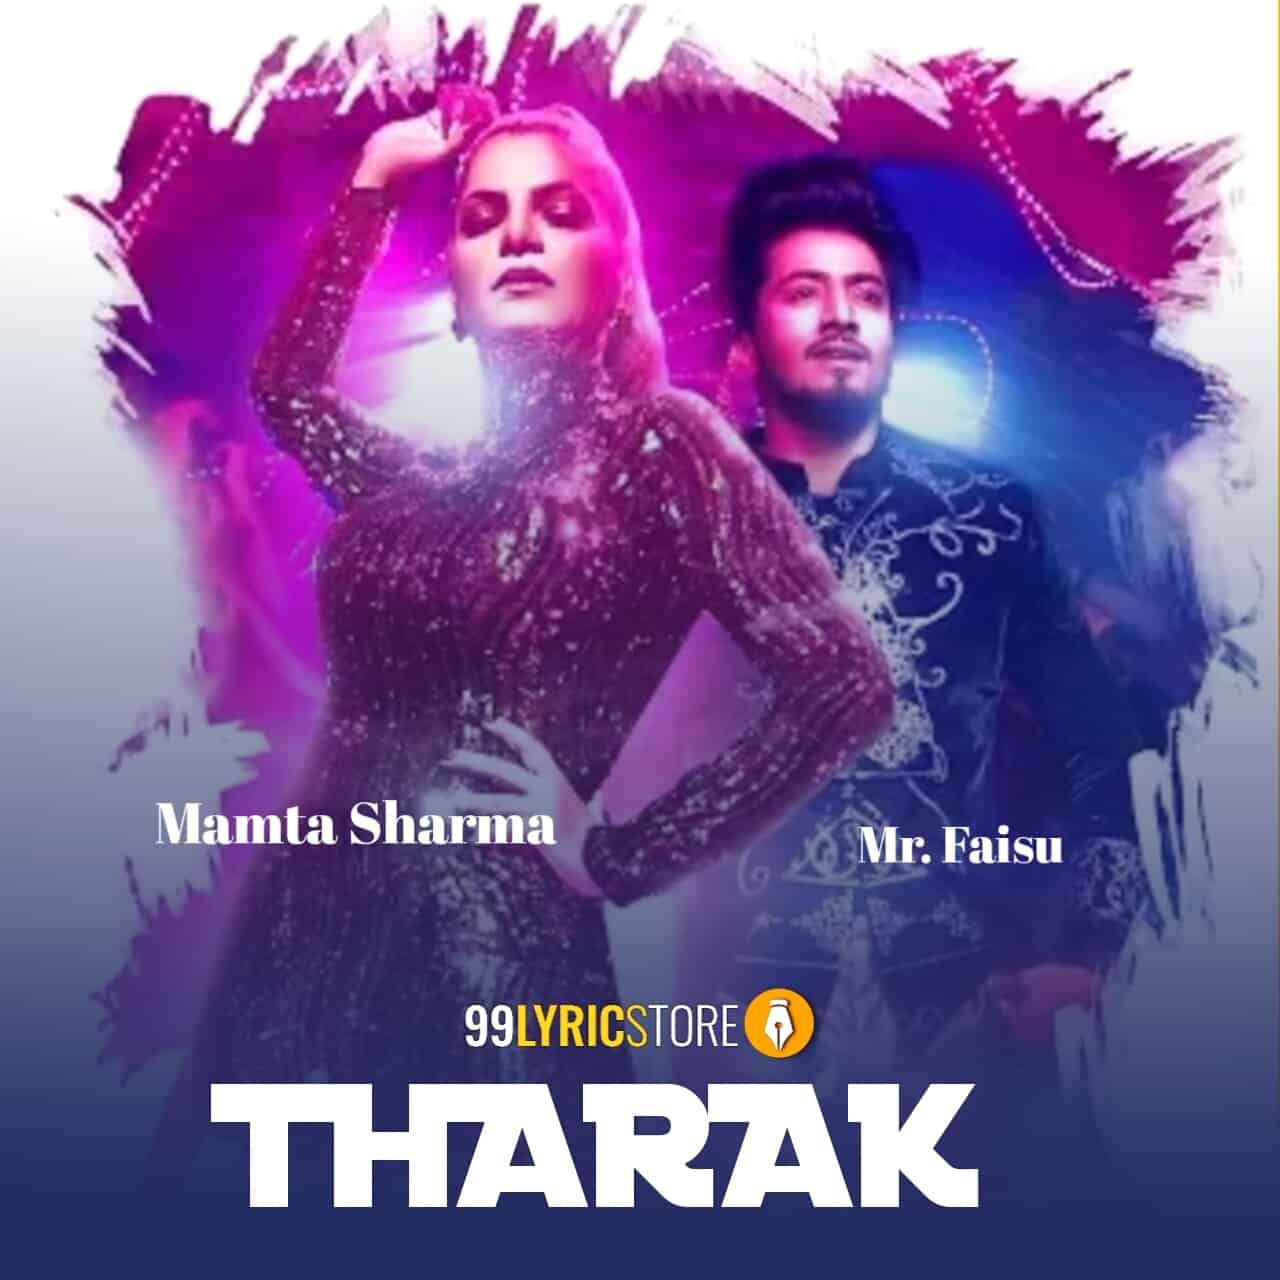 Tharak Lyrics Mamta Sharma Mr Faisu Nakash Aziz Lyrics Number Song Music Composers